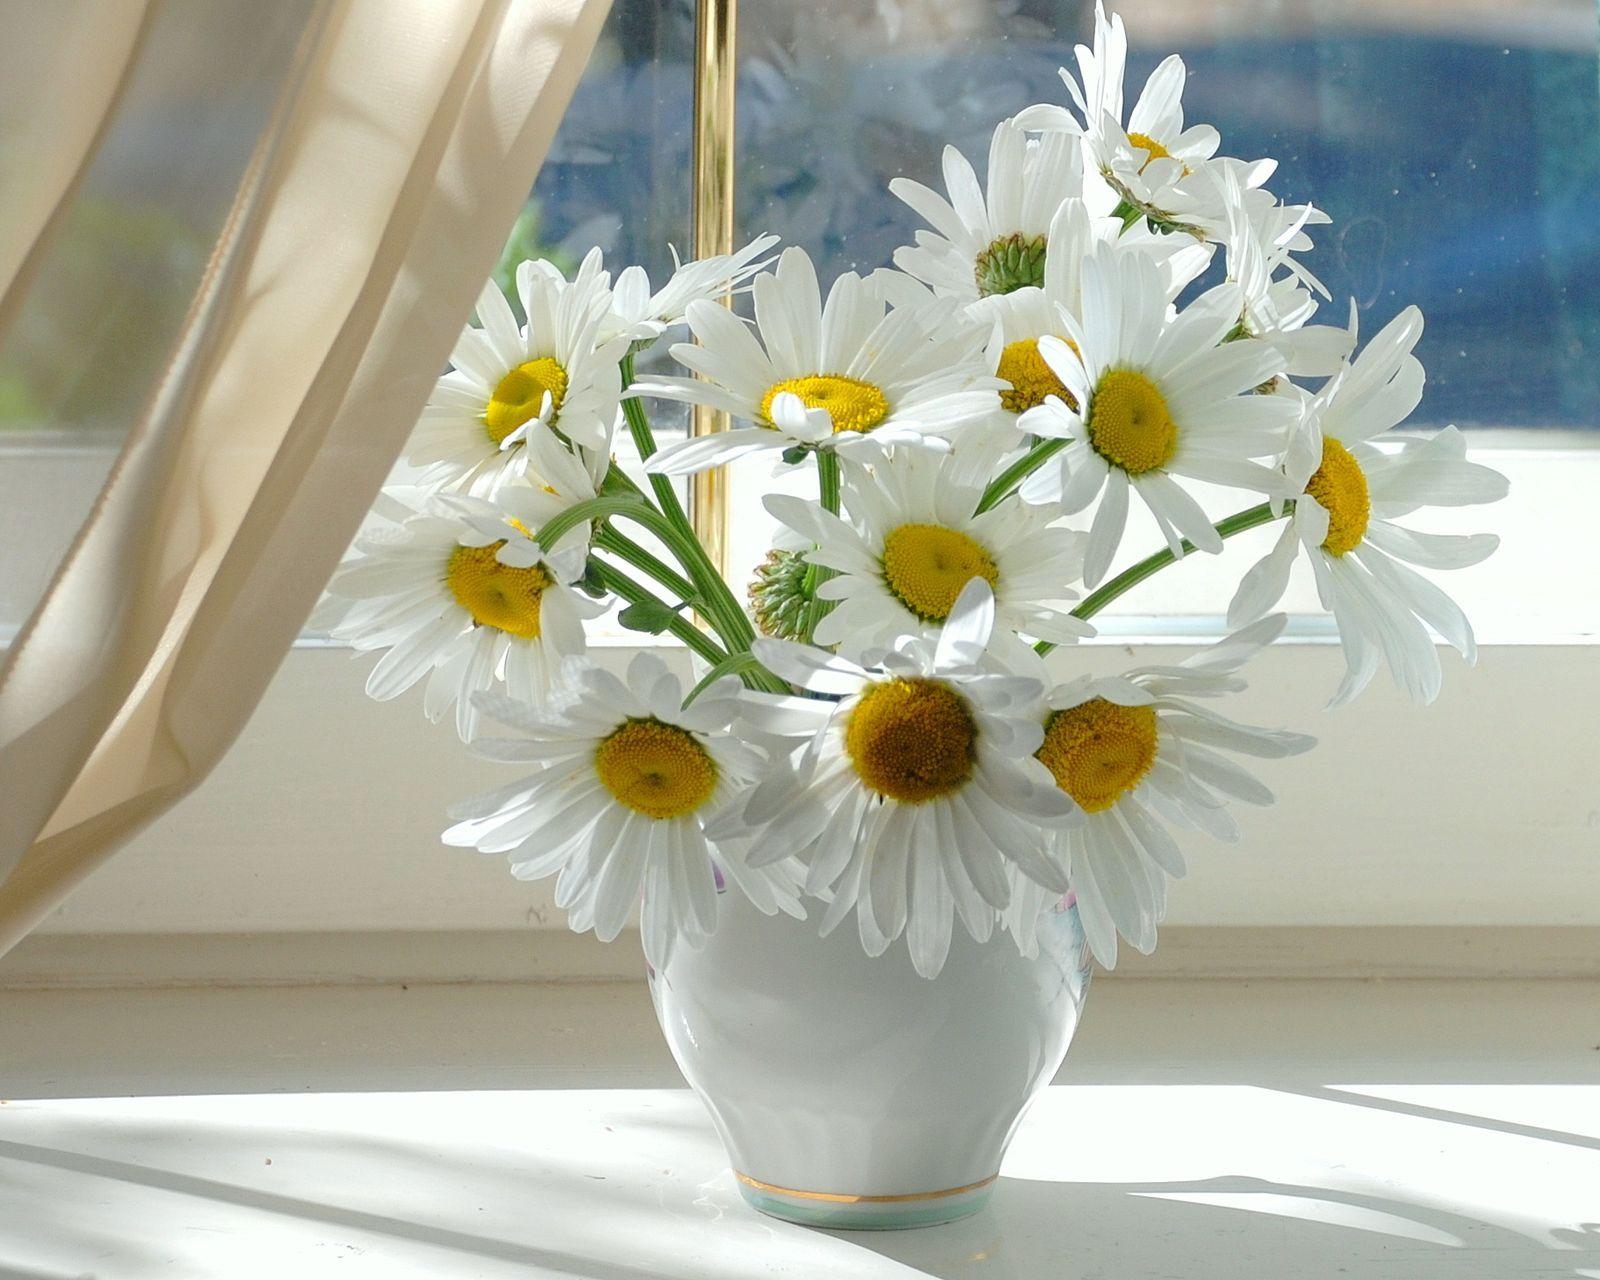 download wallpaper daisies sill vase bouquet free desktop